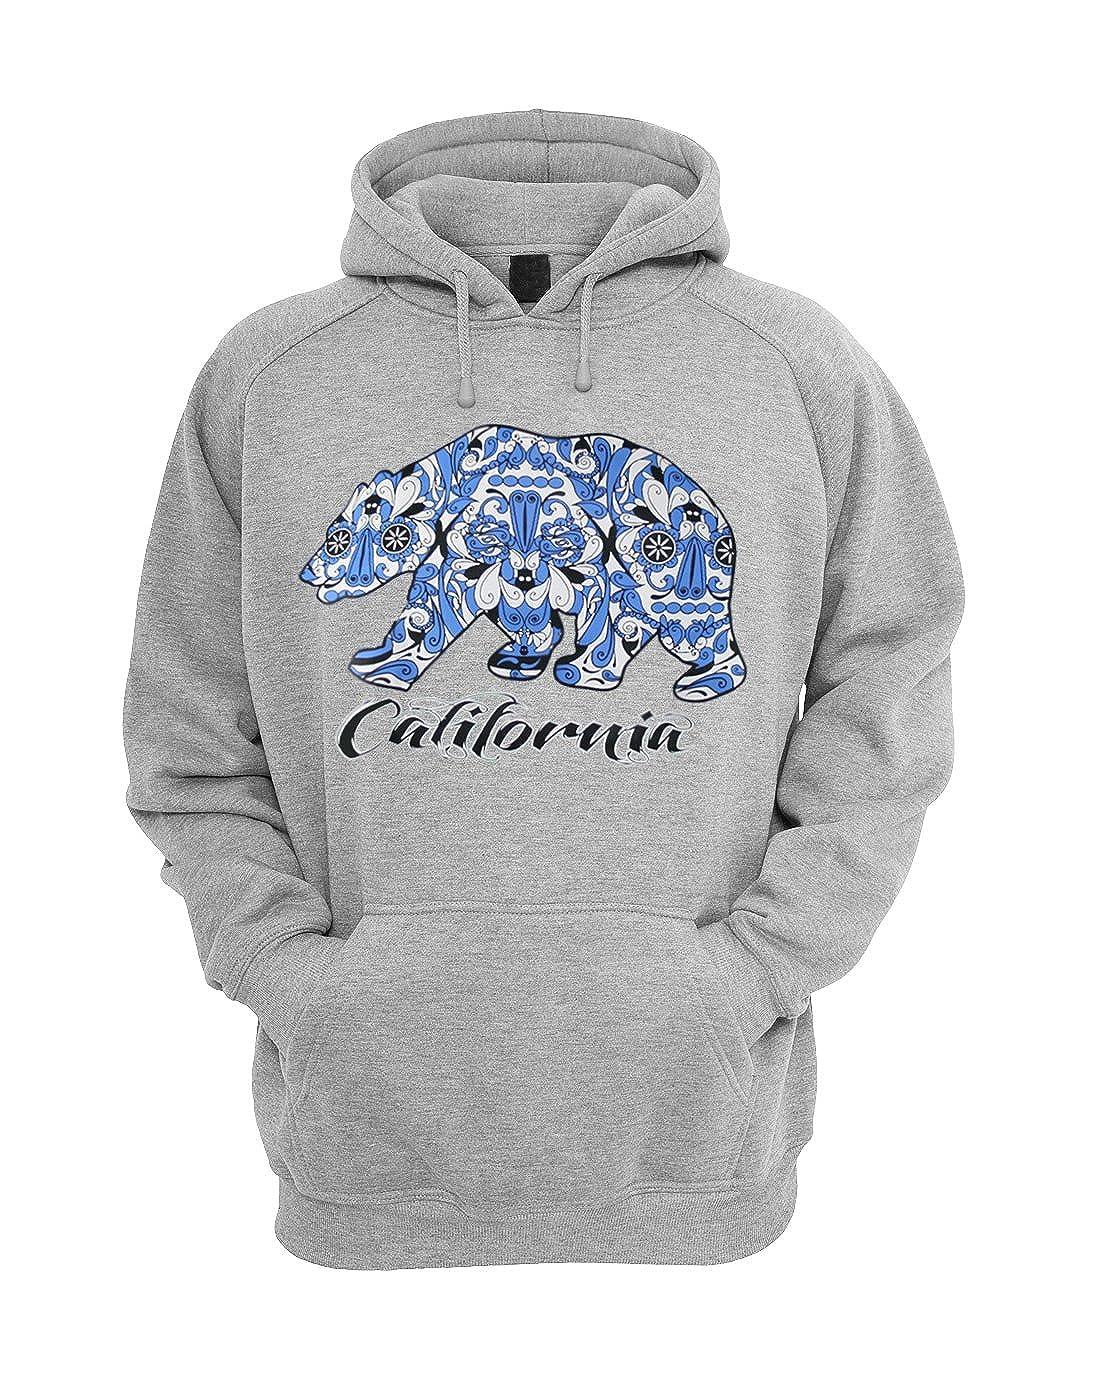 California Republic Design Unisex Hoodie Hooded Sweatshirt